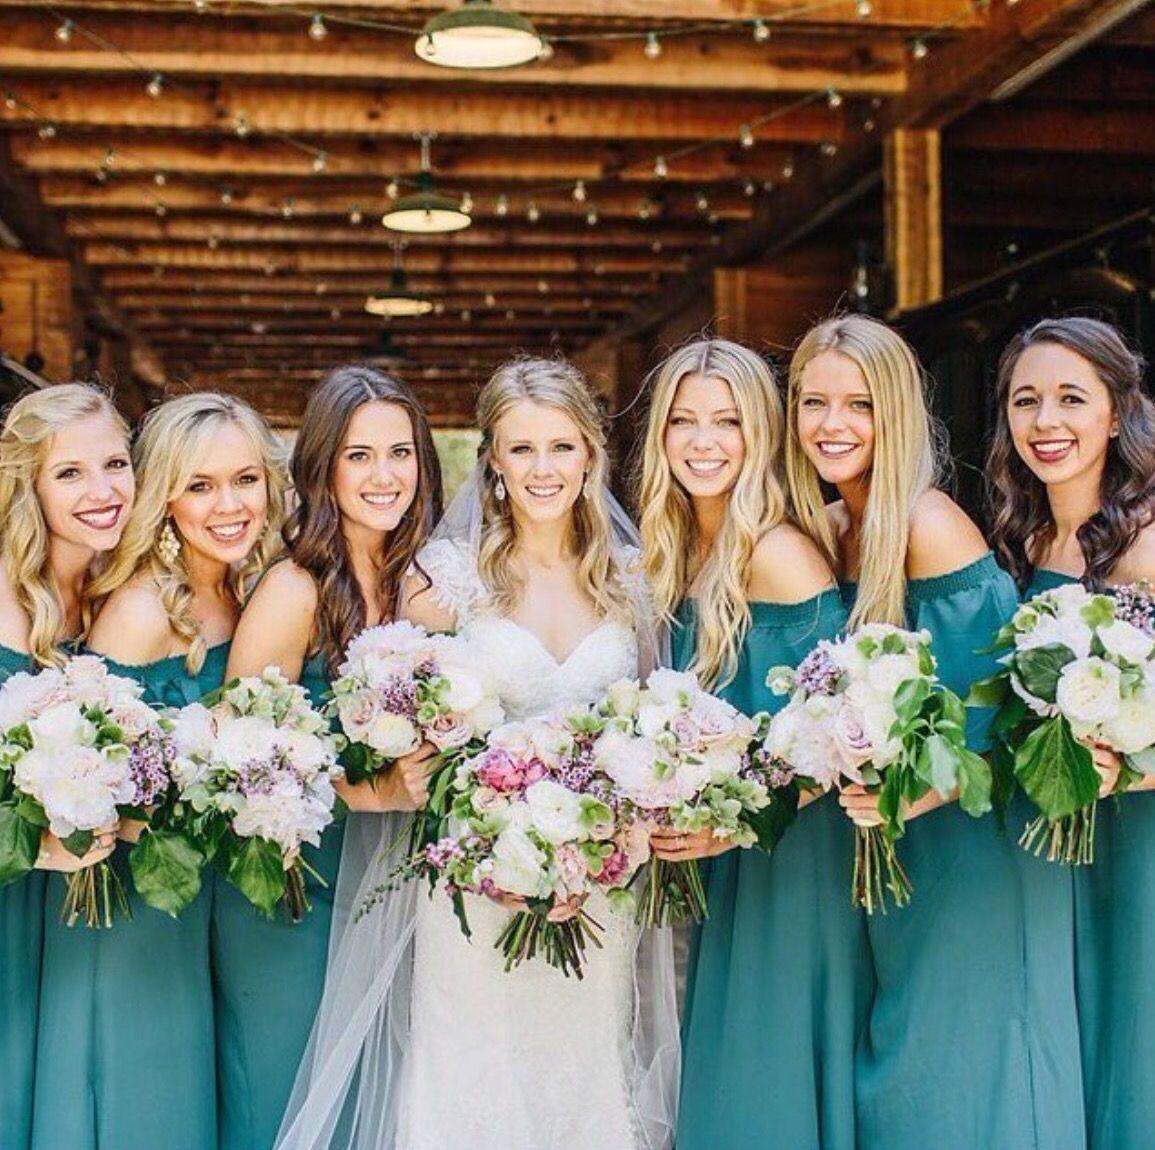 Show me your mumu hutch green bridesmaid dresses mumu weddings show me your mumu hutch green bridesmaid dresses mumu weddings ombrellifo Image collections